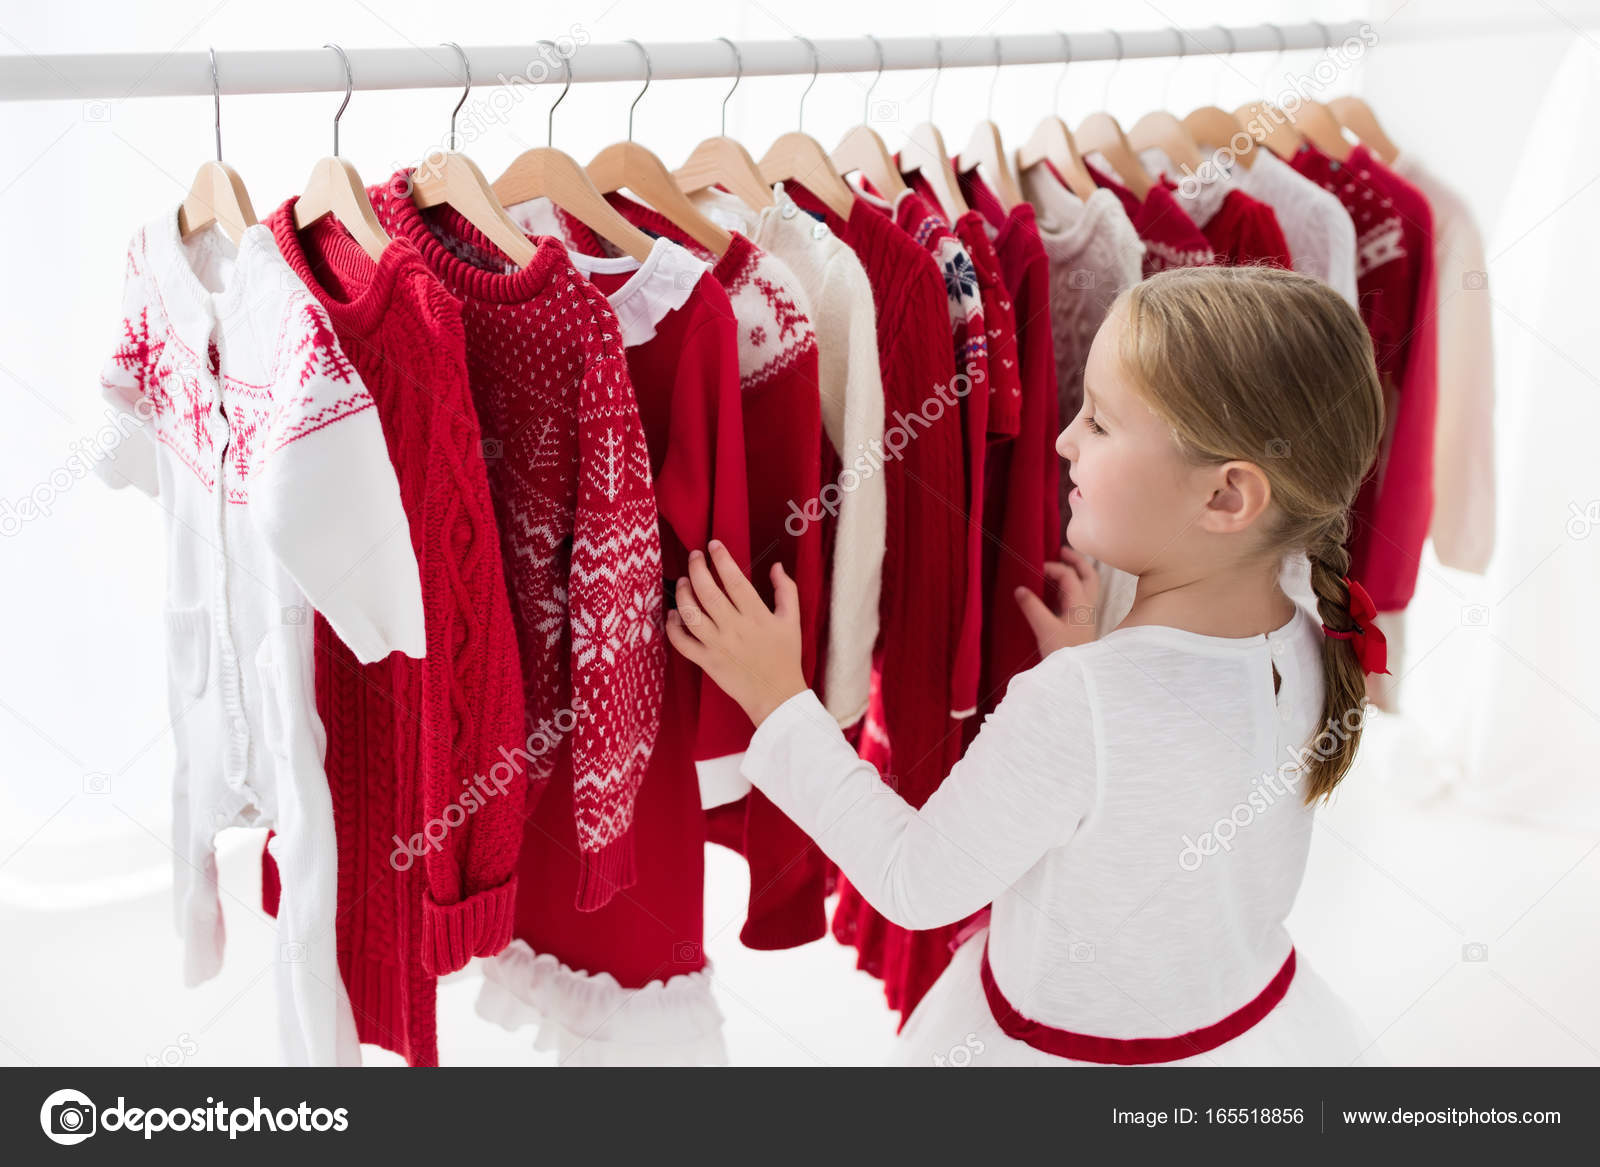 f8d9f4567677 Ντουλάπα με πλεκτό χειμώνα πουλόβερ και φόρεμα. Χριστούγεννα συλλογή  ενδυμάτων. Χριστουγεννιάτικα ψώνια. ΠΡΟΣΦΟΡΑ για παιδικά ρούχα. Παιδικά  ρούχα κατάστημα ...